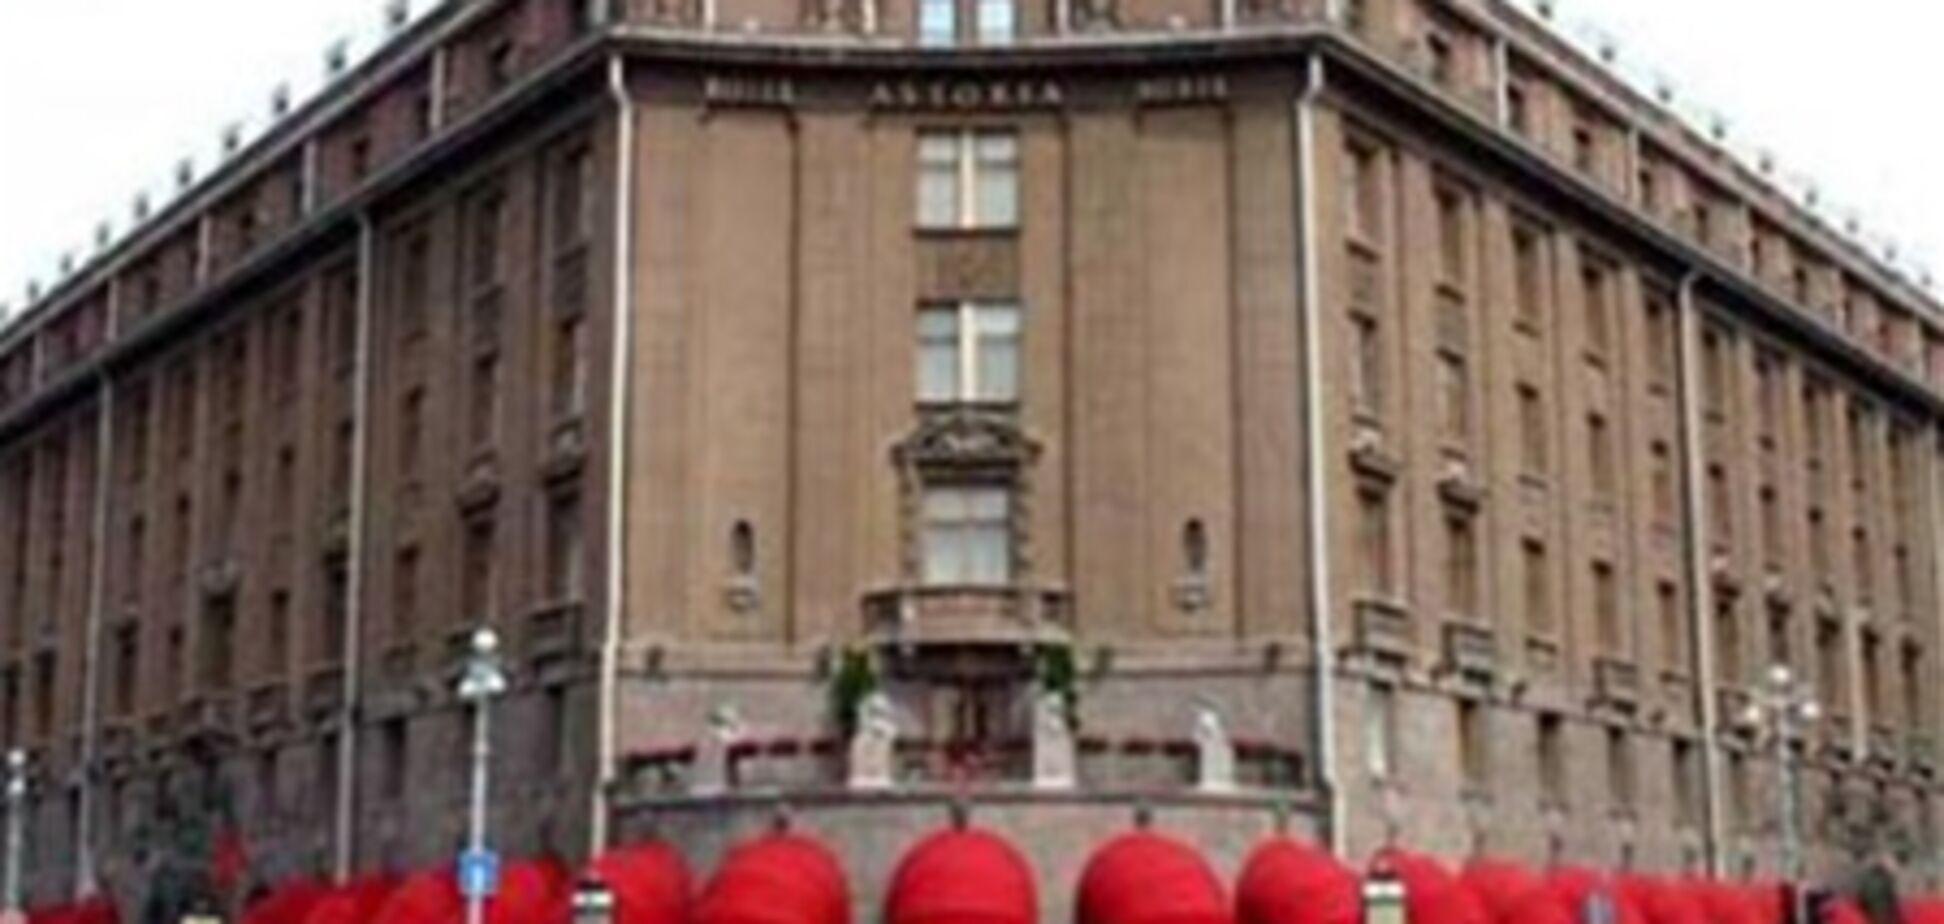 Гостиница 'Астория' подешевела на треть